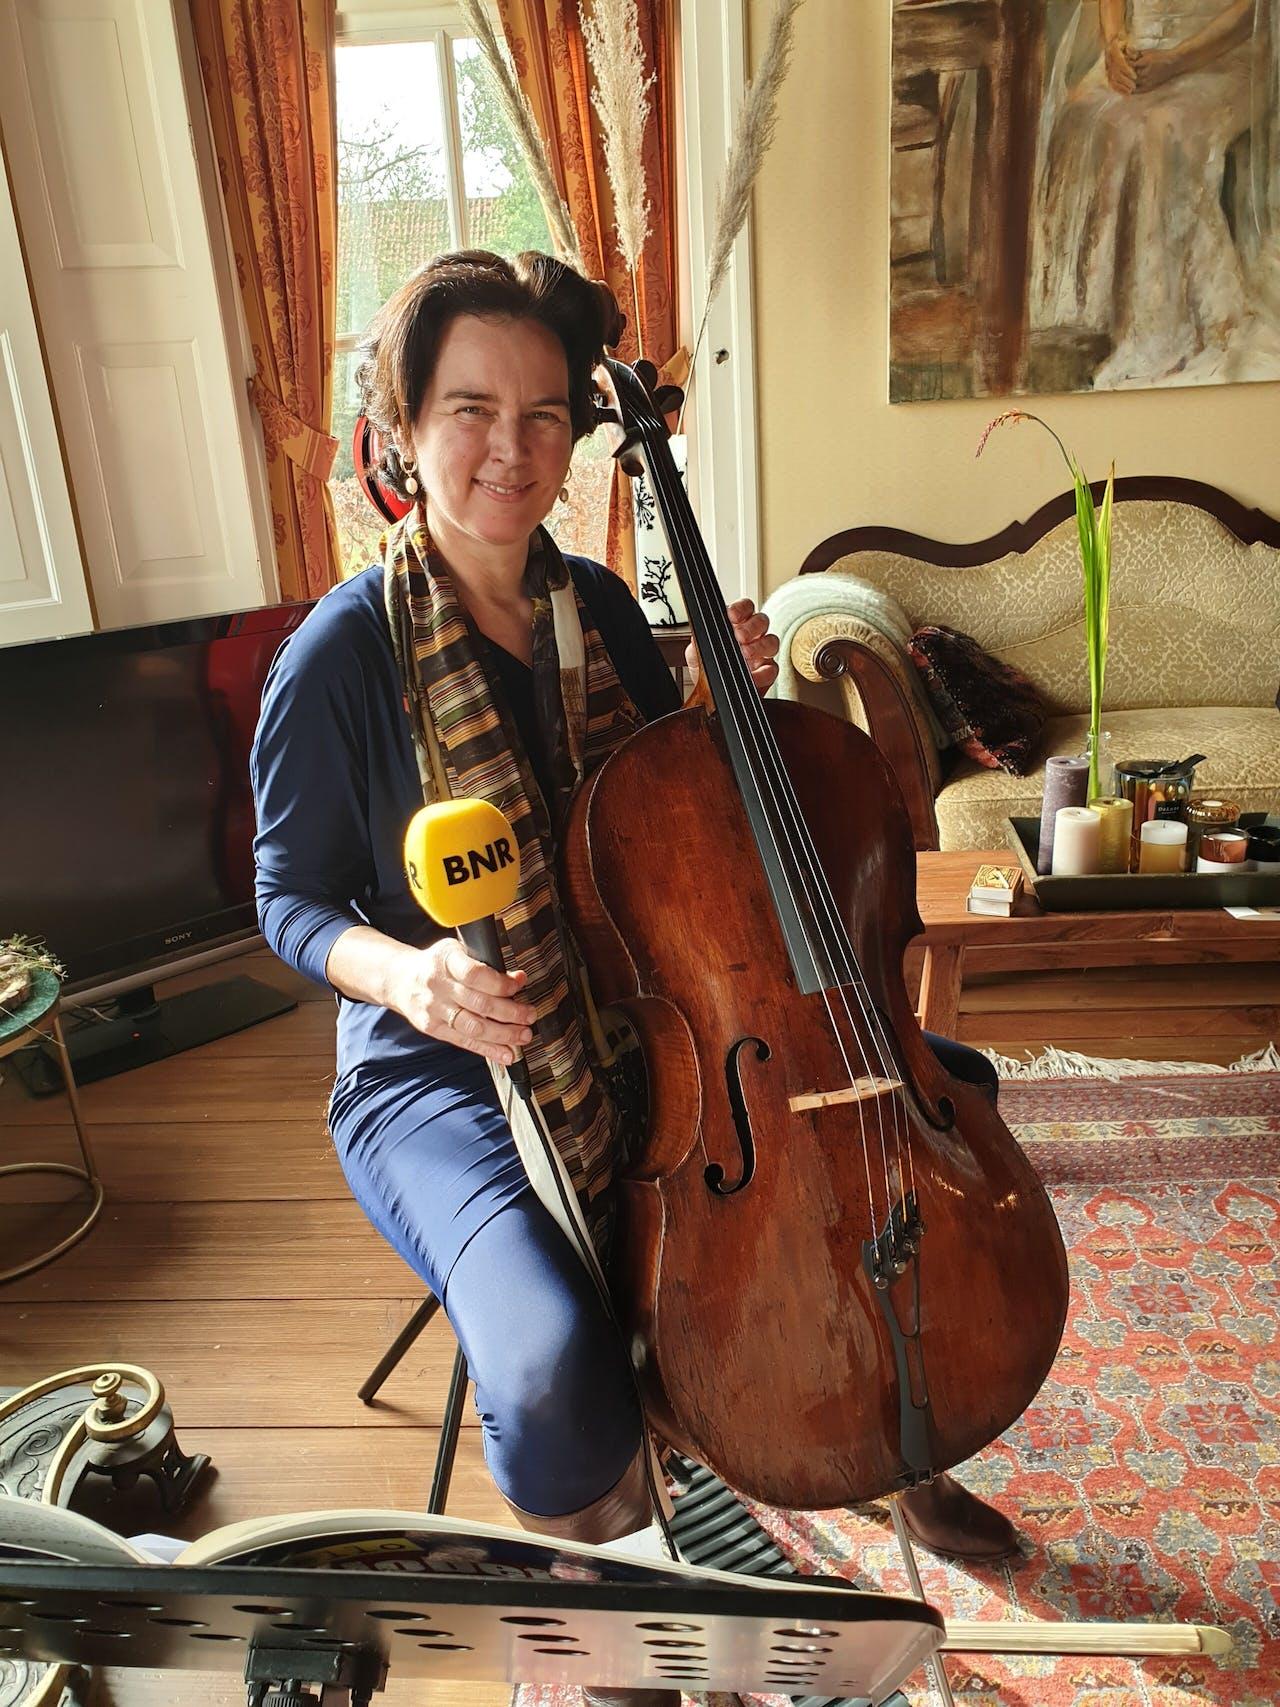 Cellist Scarlett Arts liet haar bedrijf flink groeien in Coronatijd